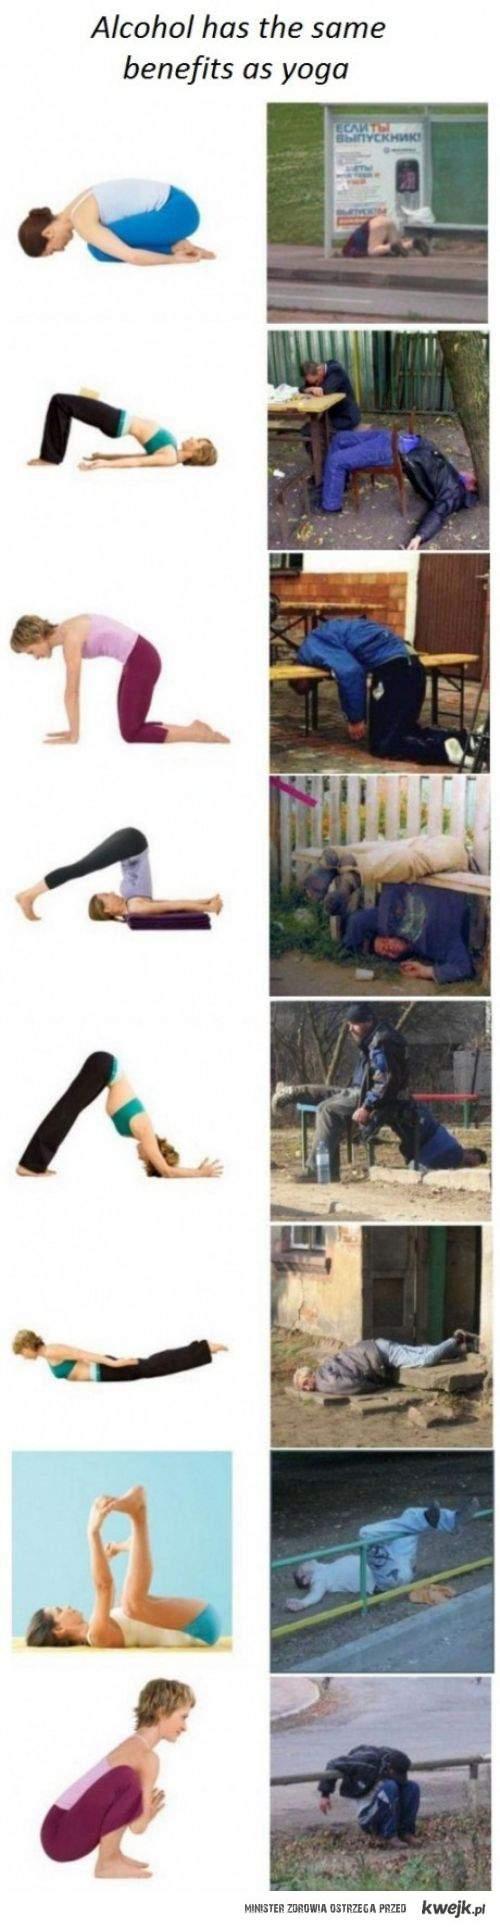 Yoga a alkohol